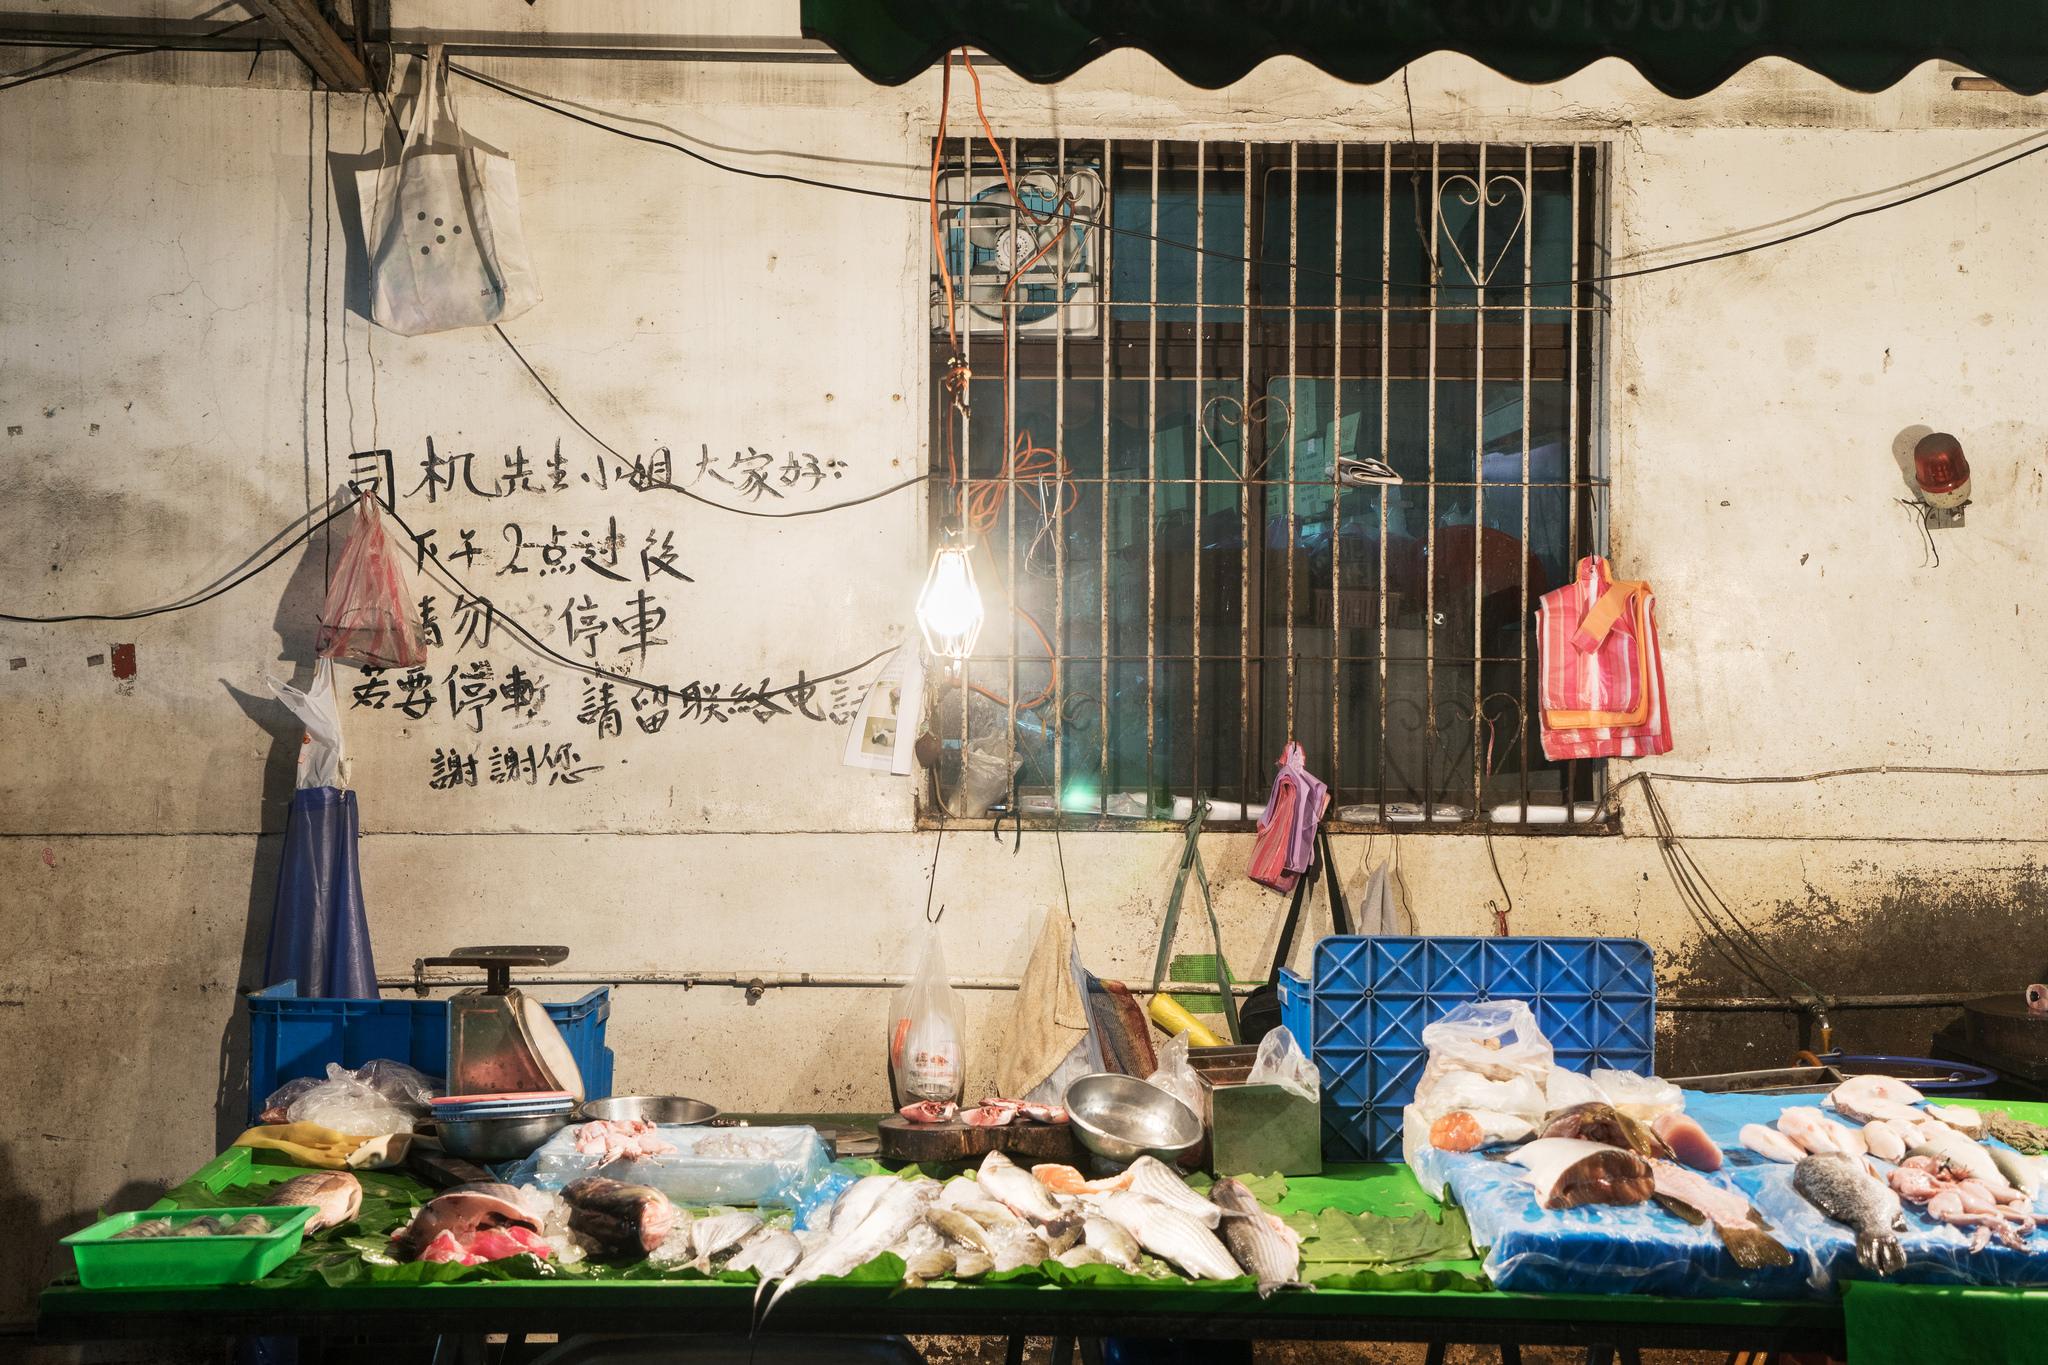 張國耀《菜市仔|Market》